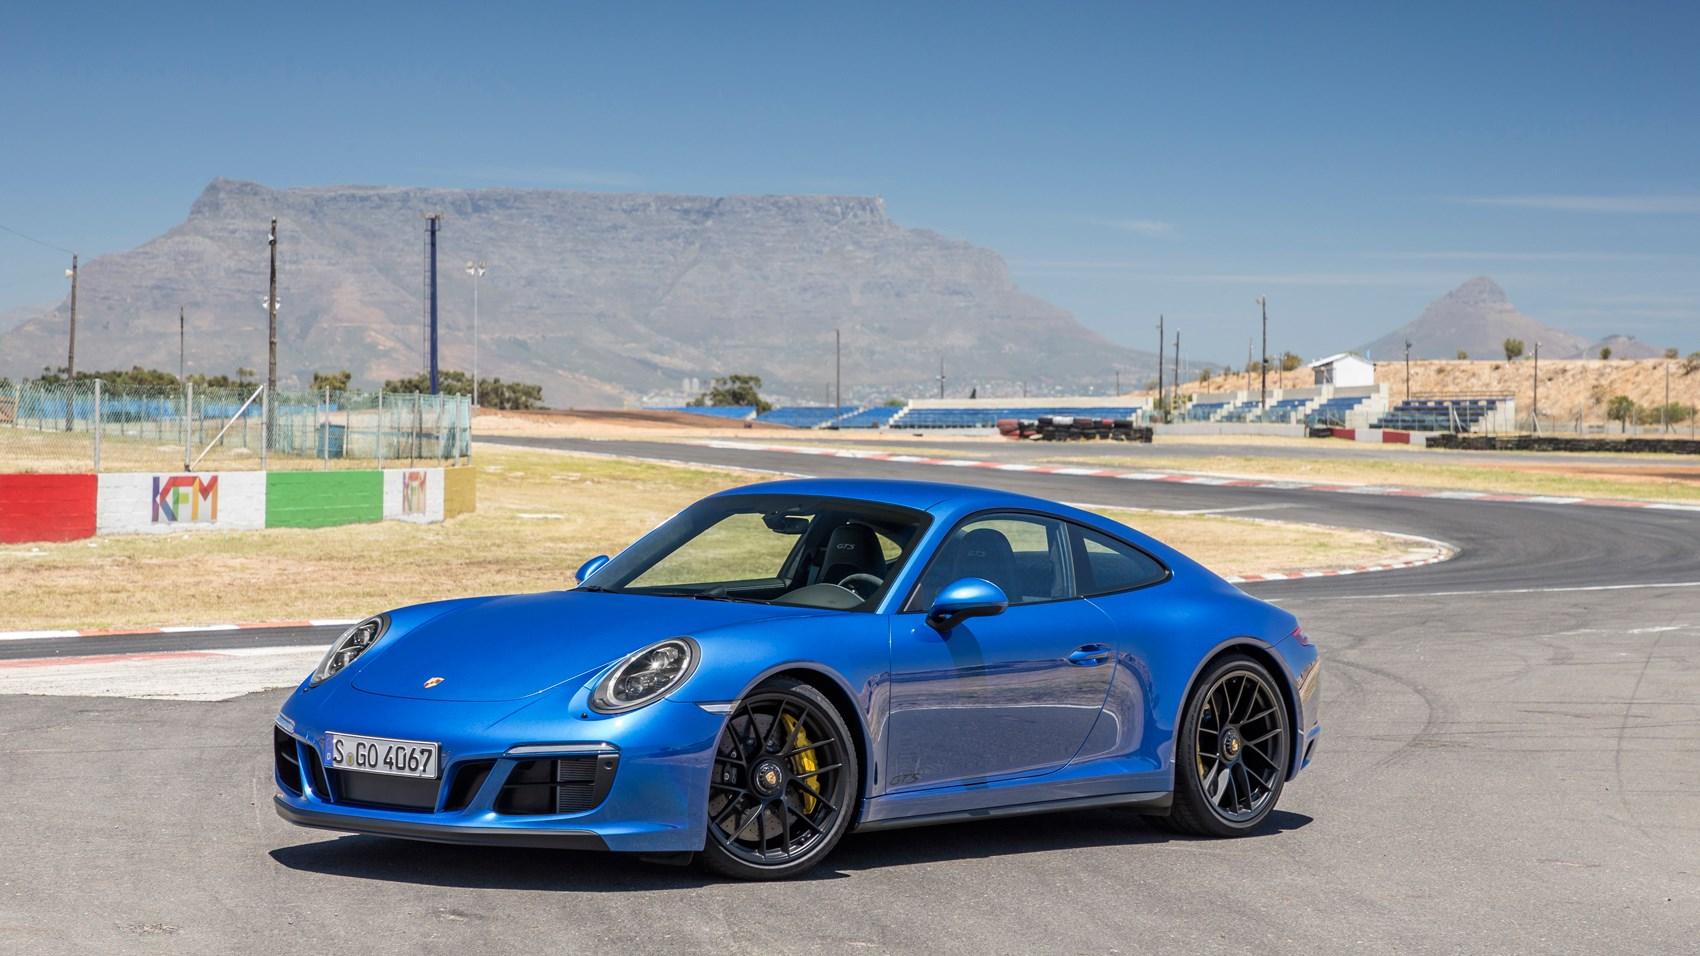 Porsche 911 Carrera 4 Gts 2018 Review All The Trimmings Car Magazine